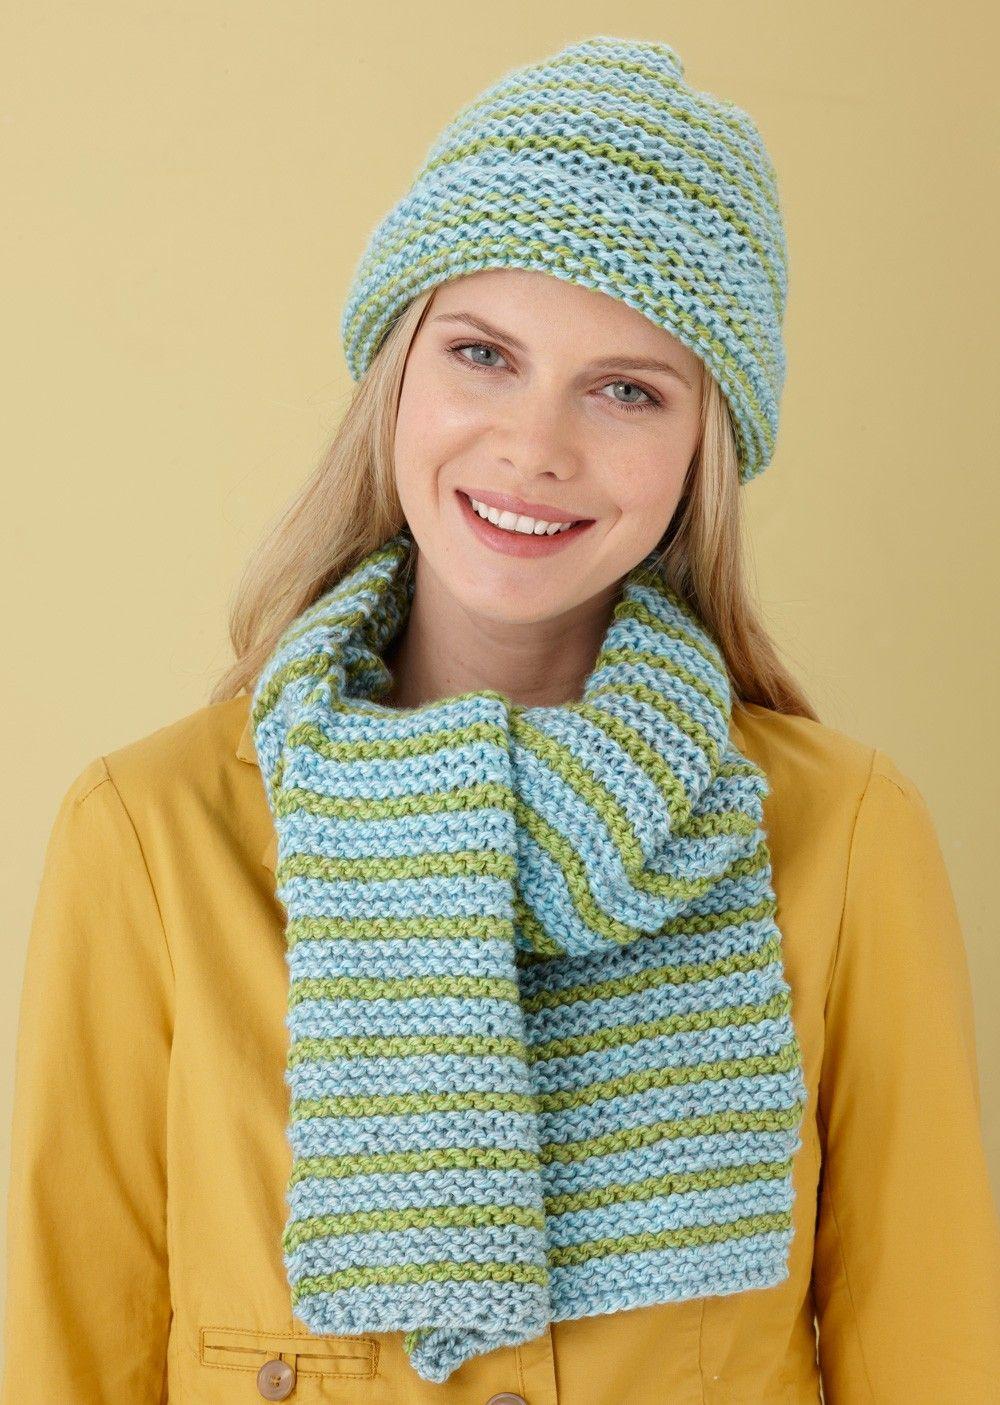 Striped Hat And Scarf Pattern (Knit) Crochet knit hat